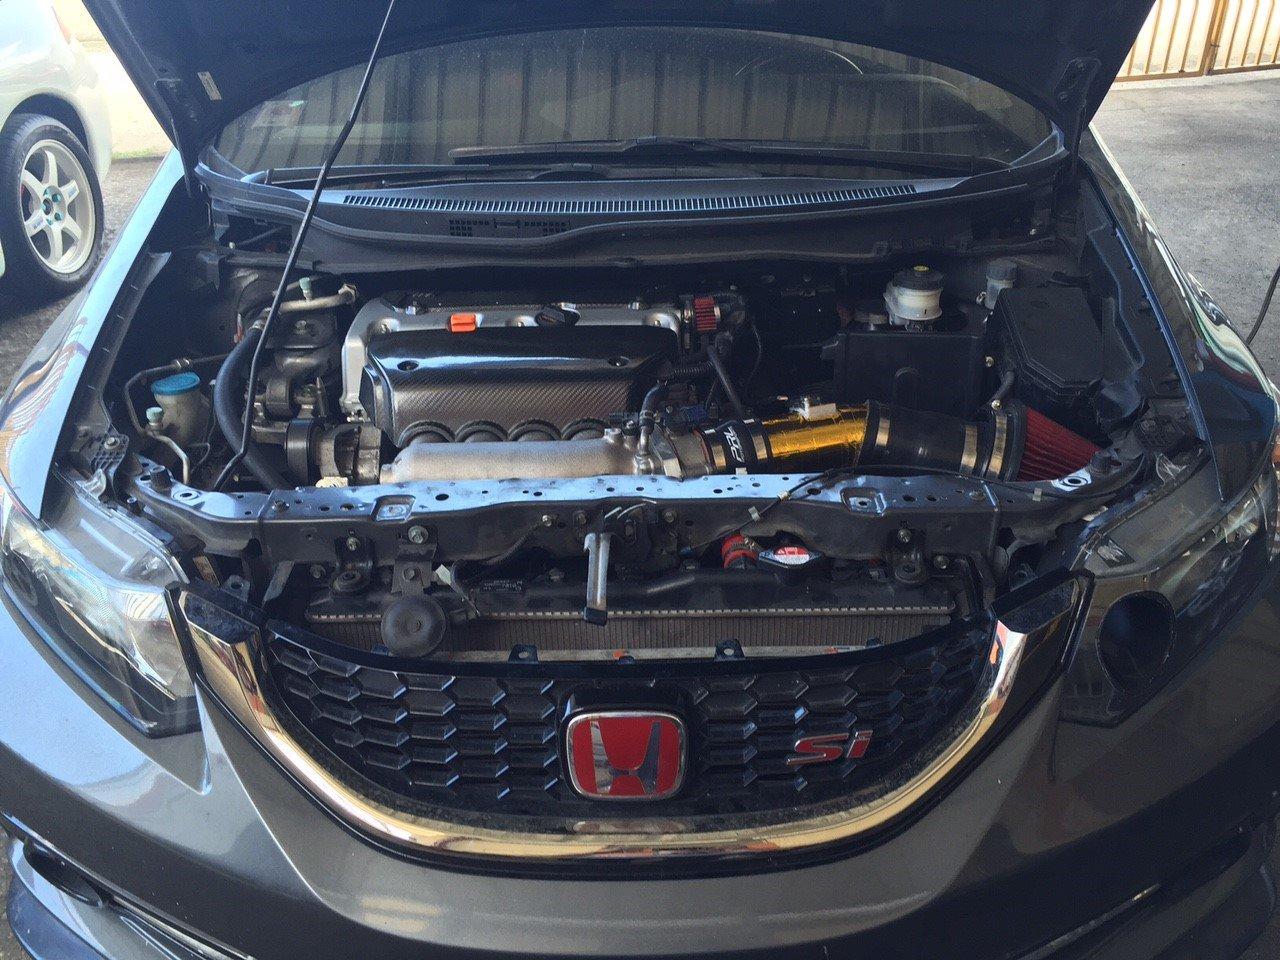 2013 Civic Si K24z7/K20-engine-bay-2.jpg